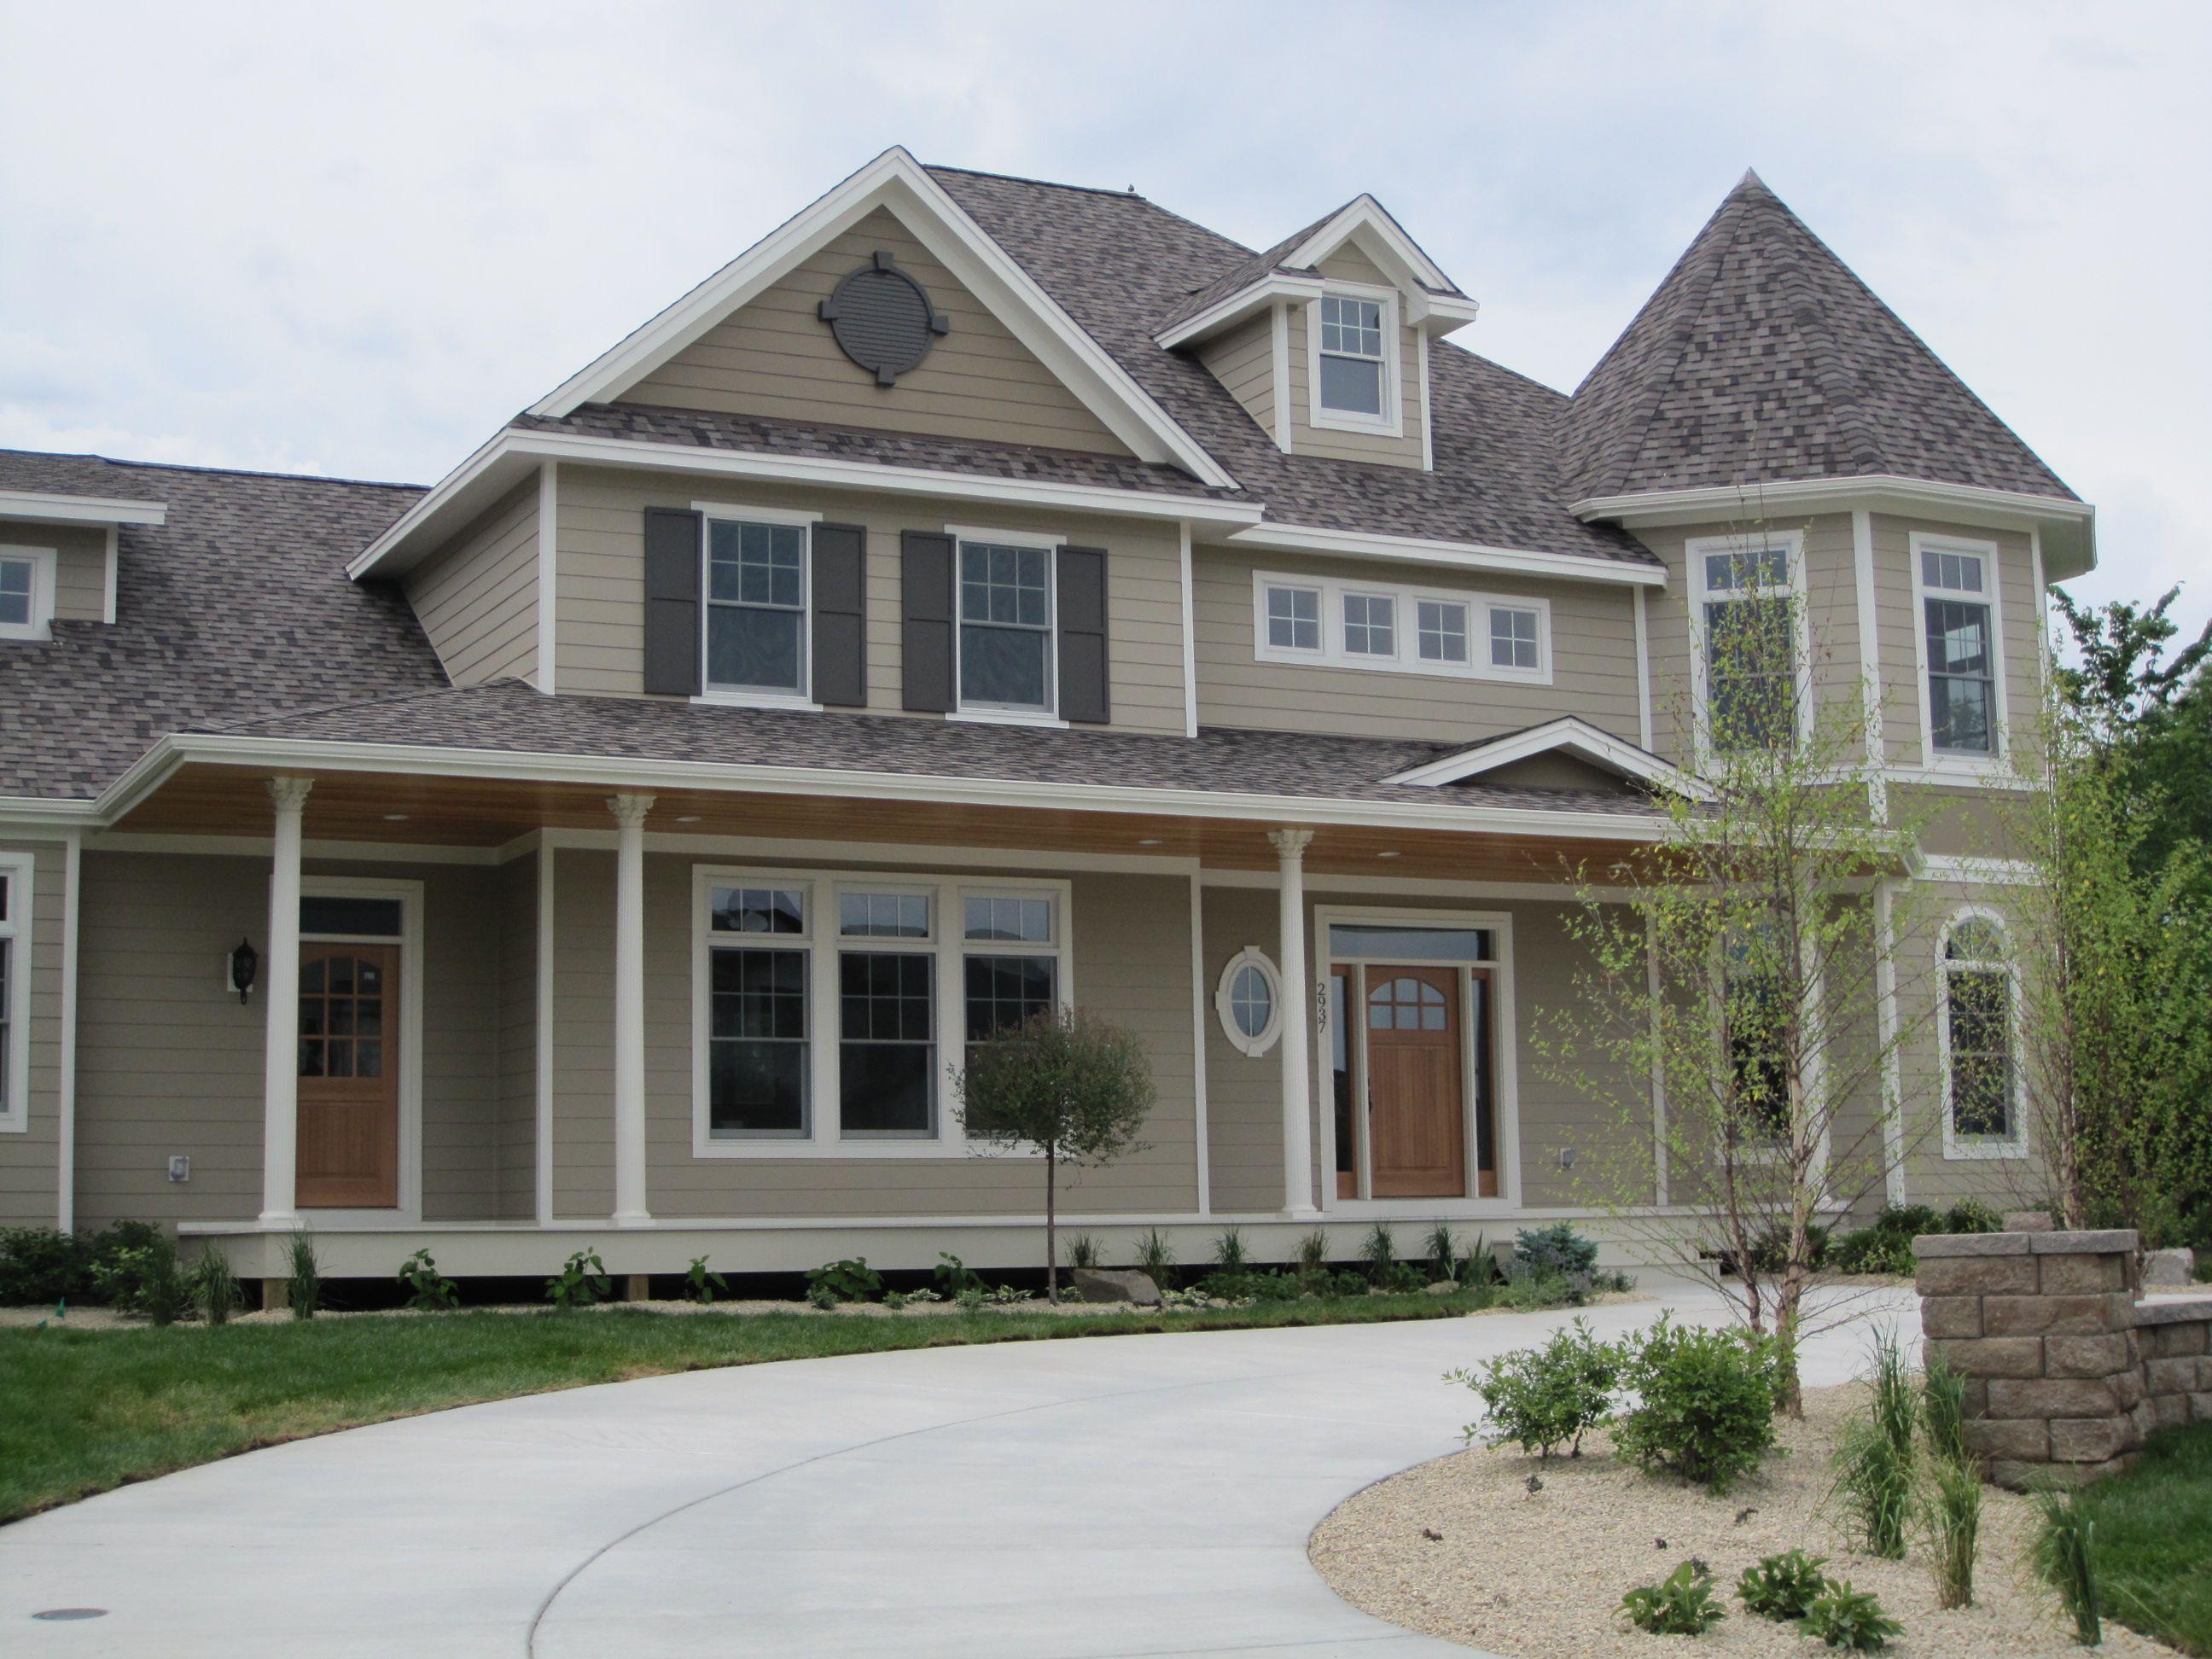 Surprising 17 Best Images About Lowes Exterior Color On Pinterest Exterior Largest Home Design Picture Inspirations Pitcheantrous